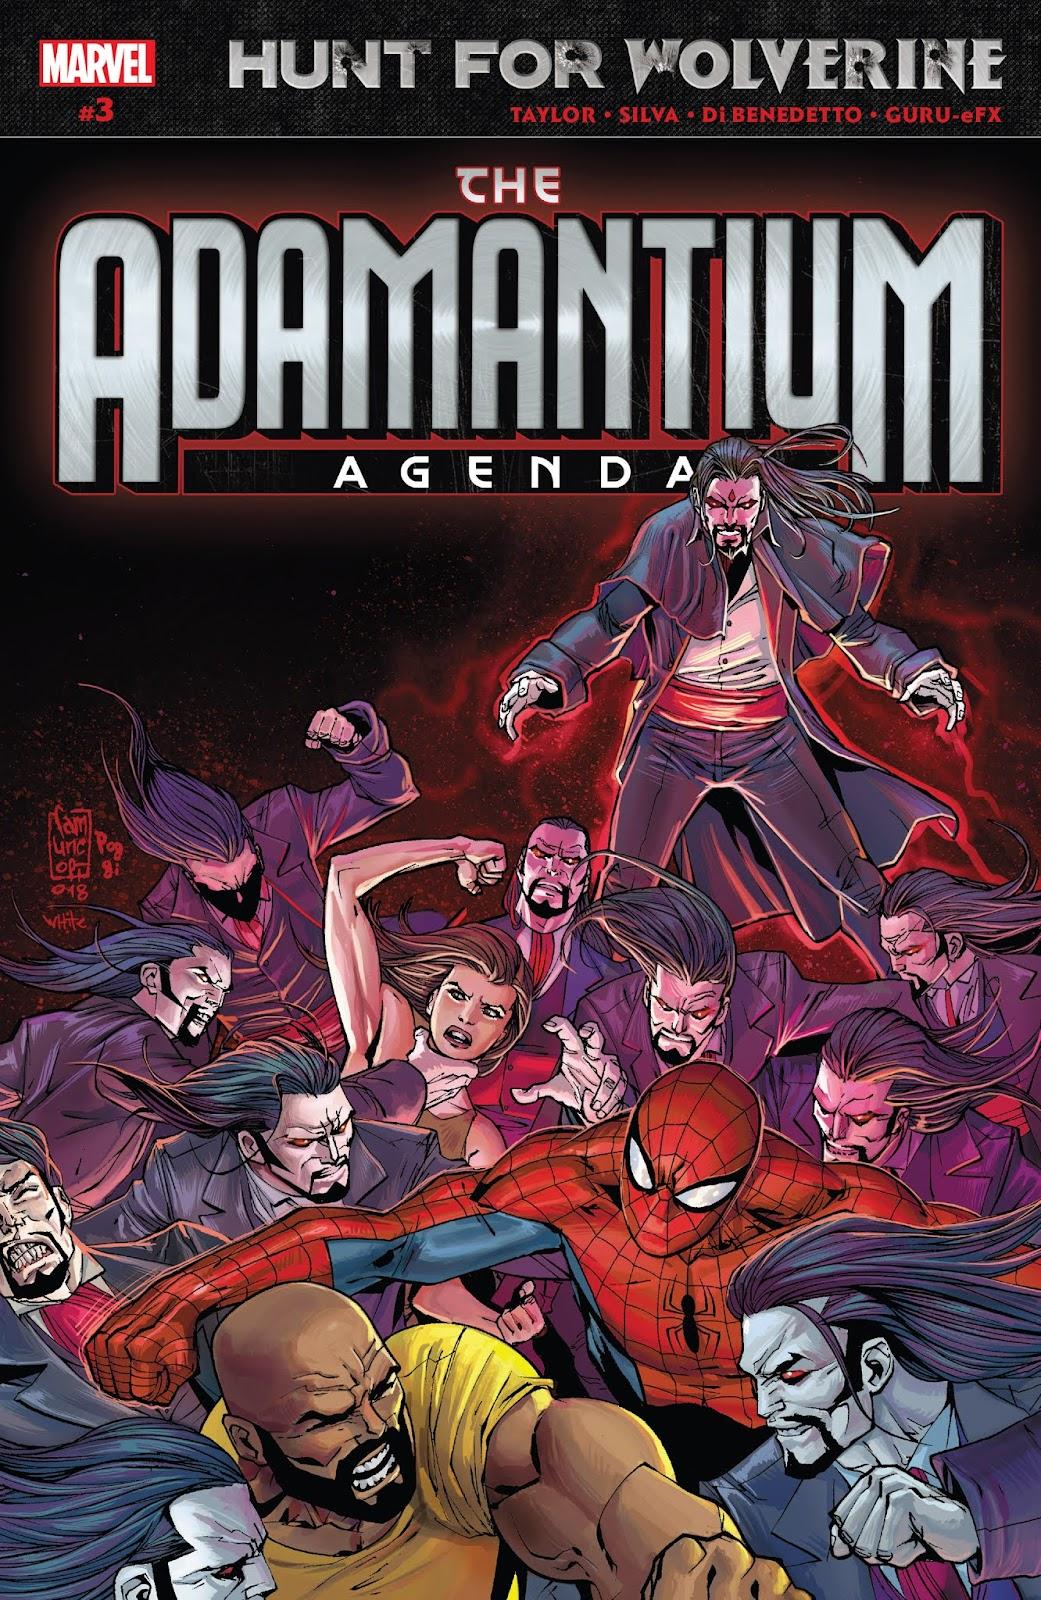 Hunt for Wolverine: Adamantium Agenda issue 3 - Page 1